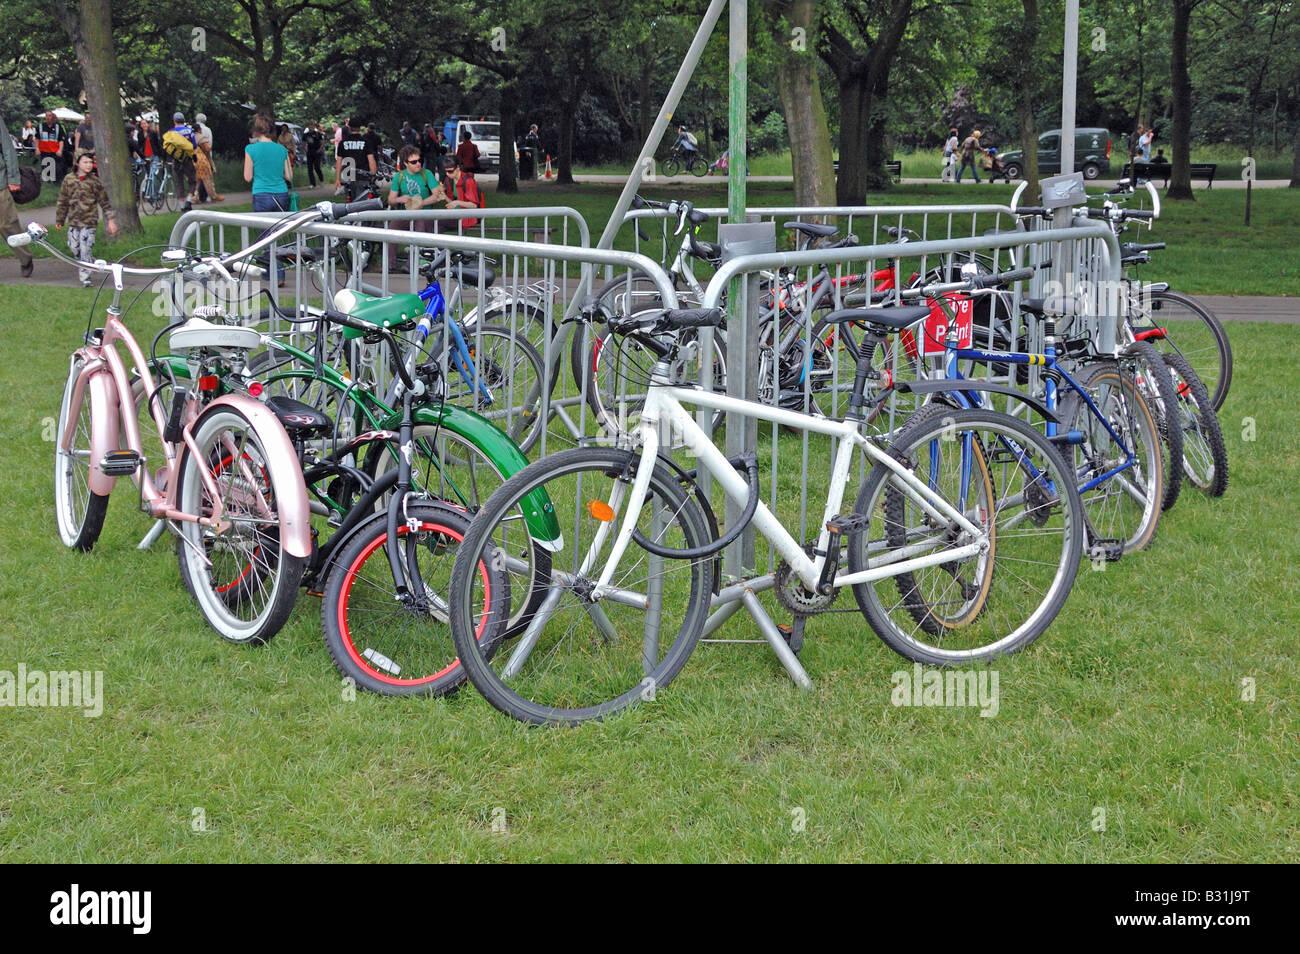 Cycle park at Camden Green Fair London England UK Stock Photo